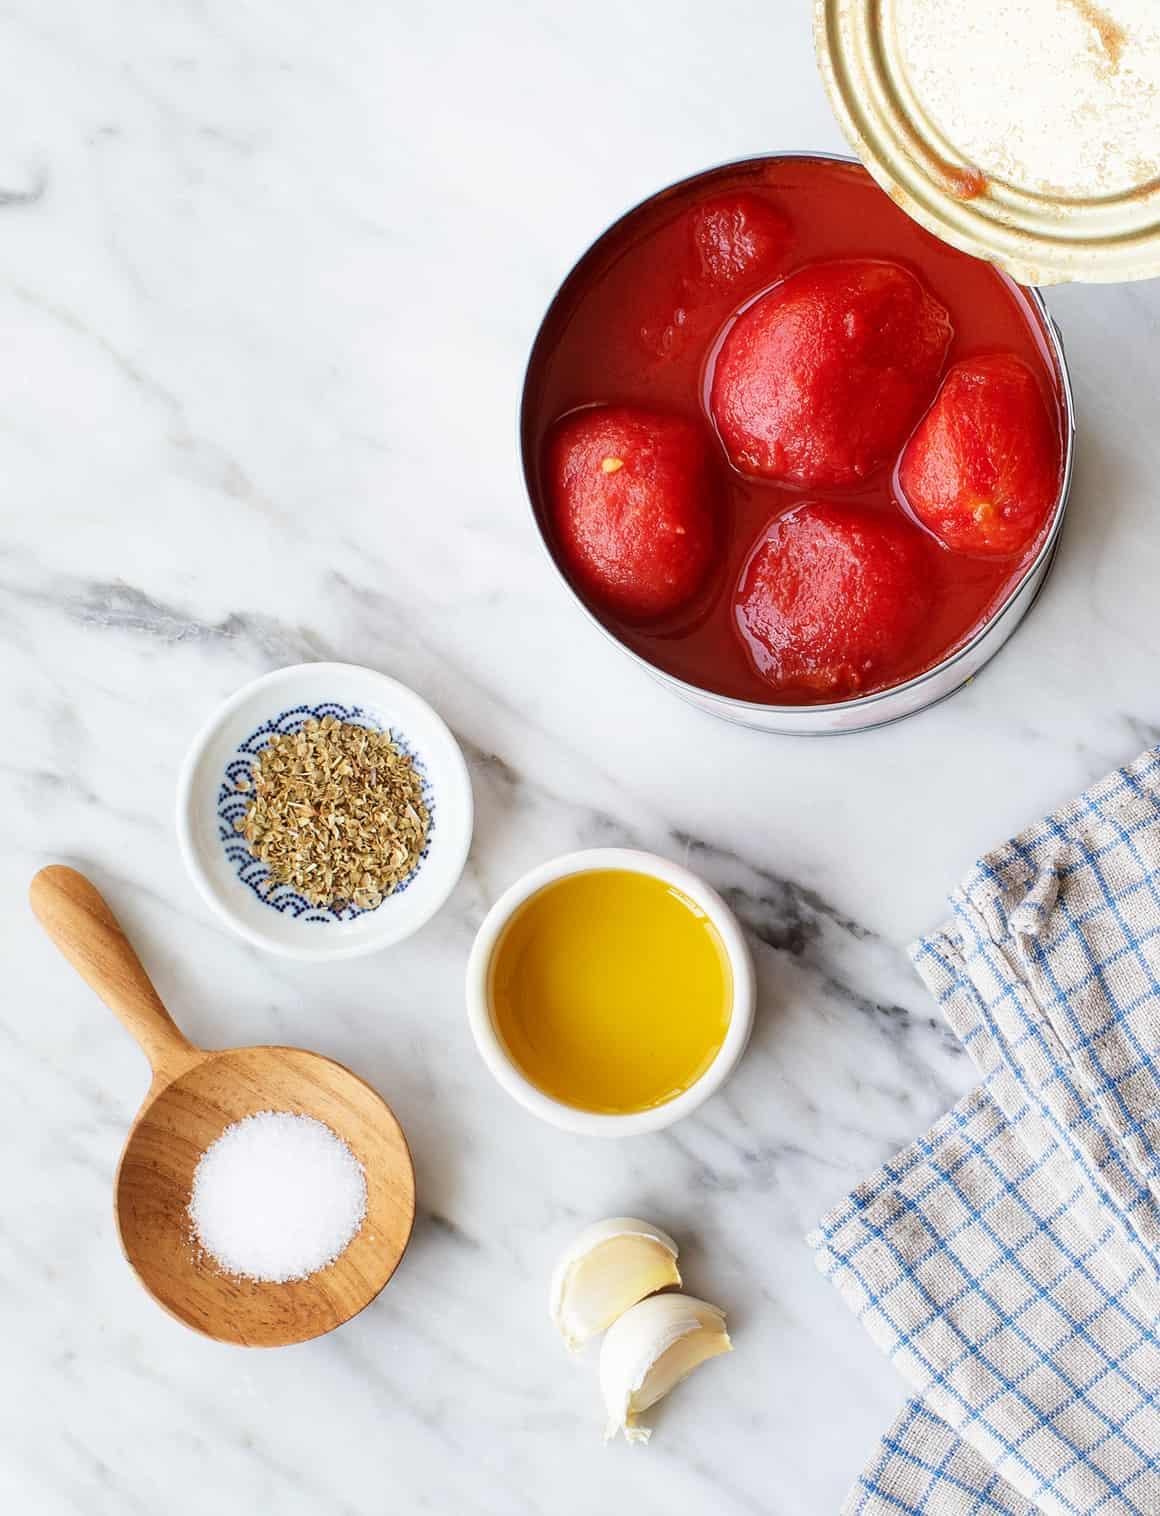 Pizza sauce recipe ingredients